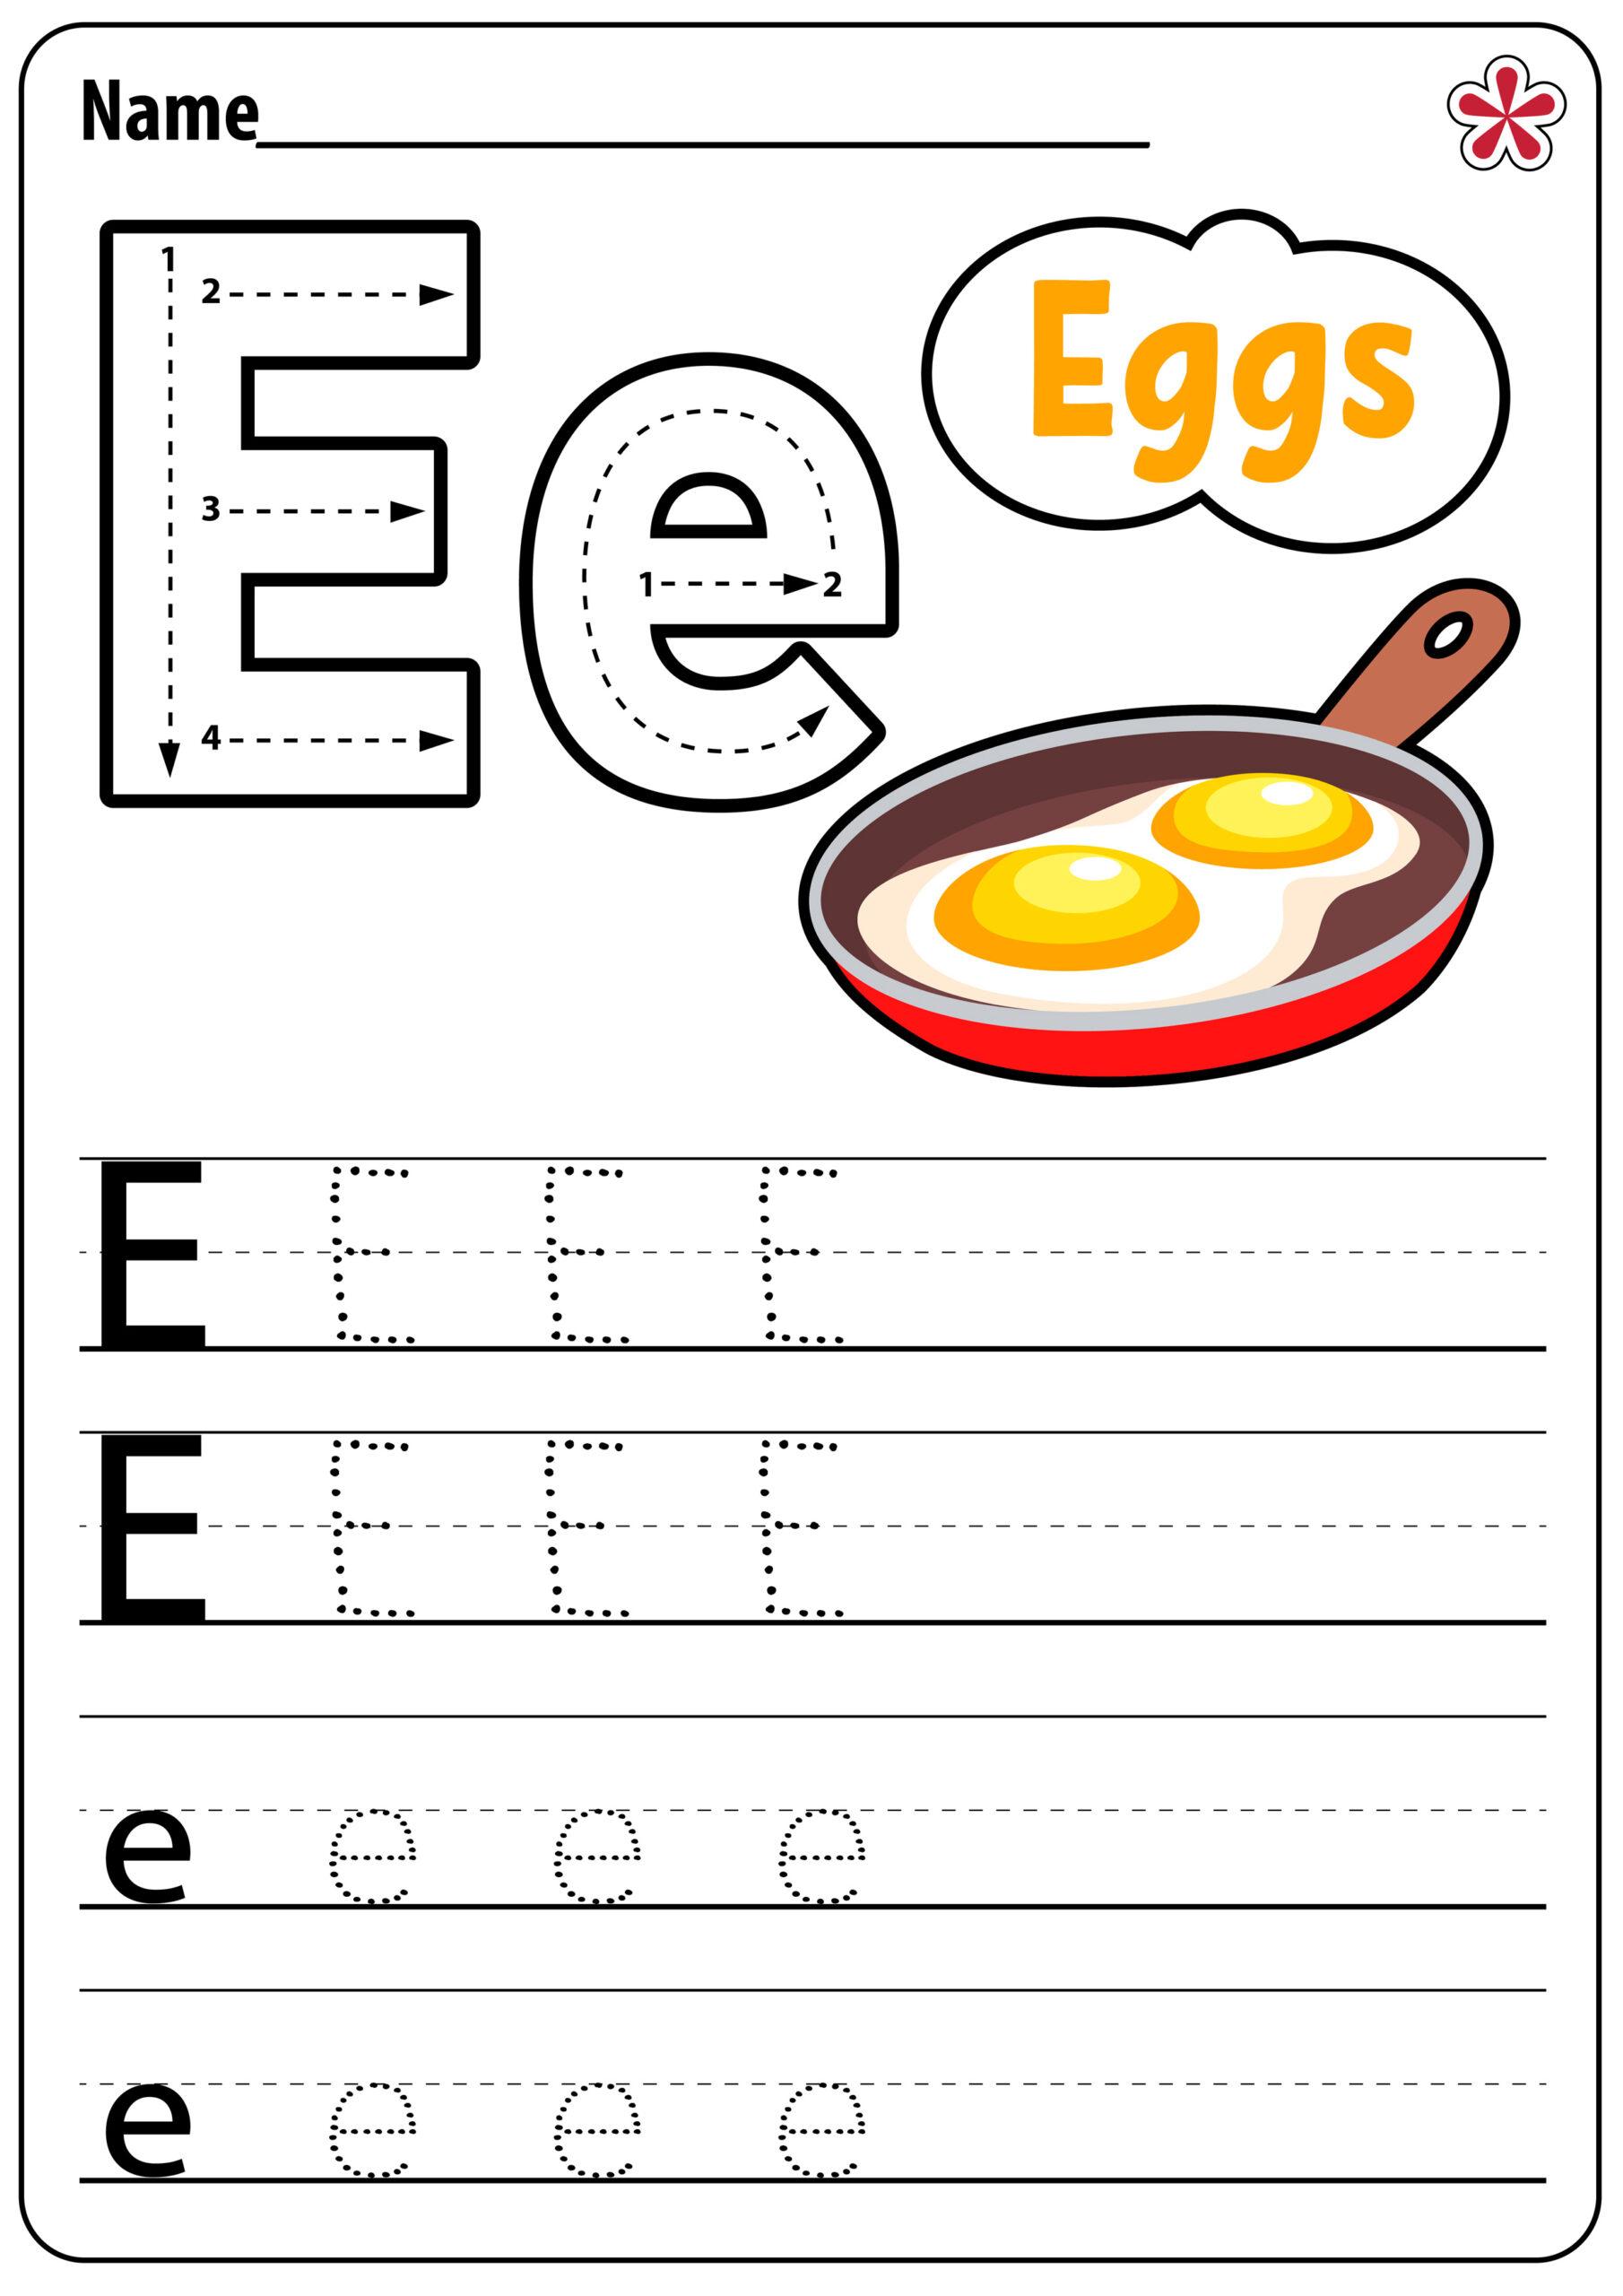 Letter Worksheets For Kindergarten And Preschool Teachersmag regarding Alphabet E Worksheets Kindergarten